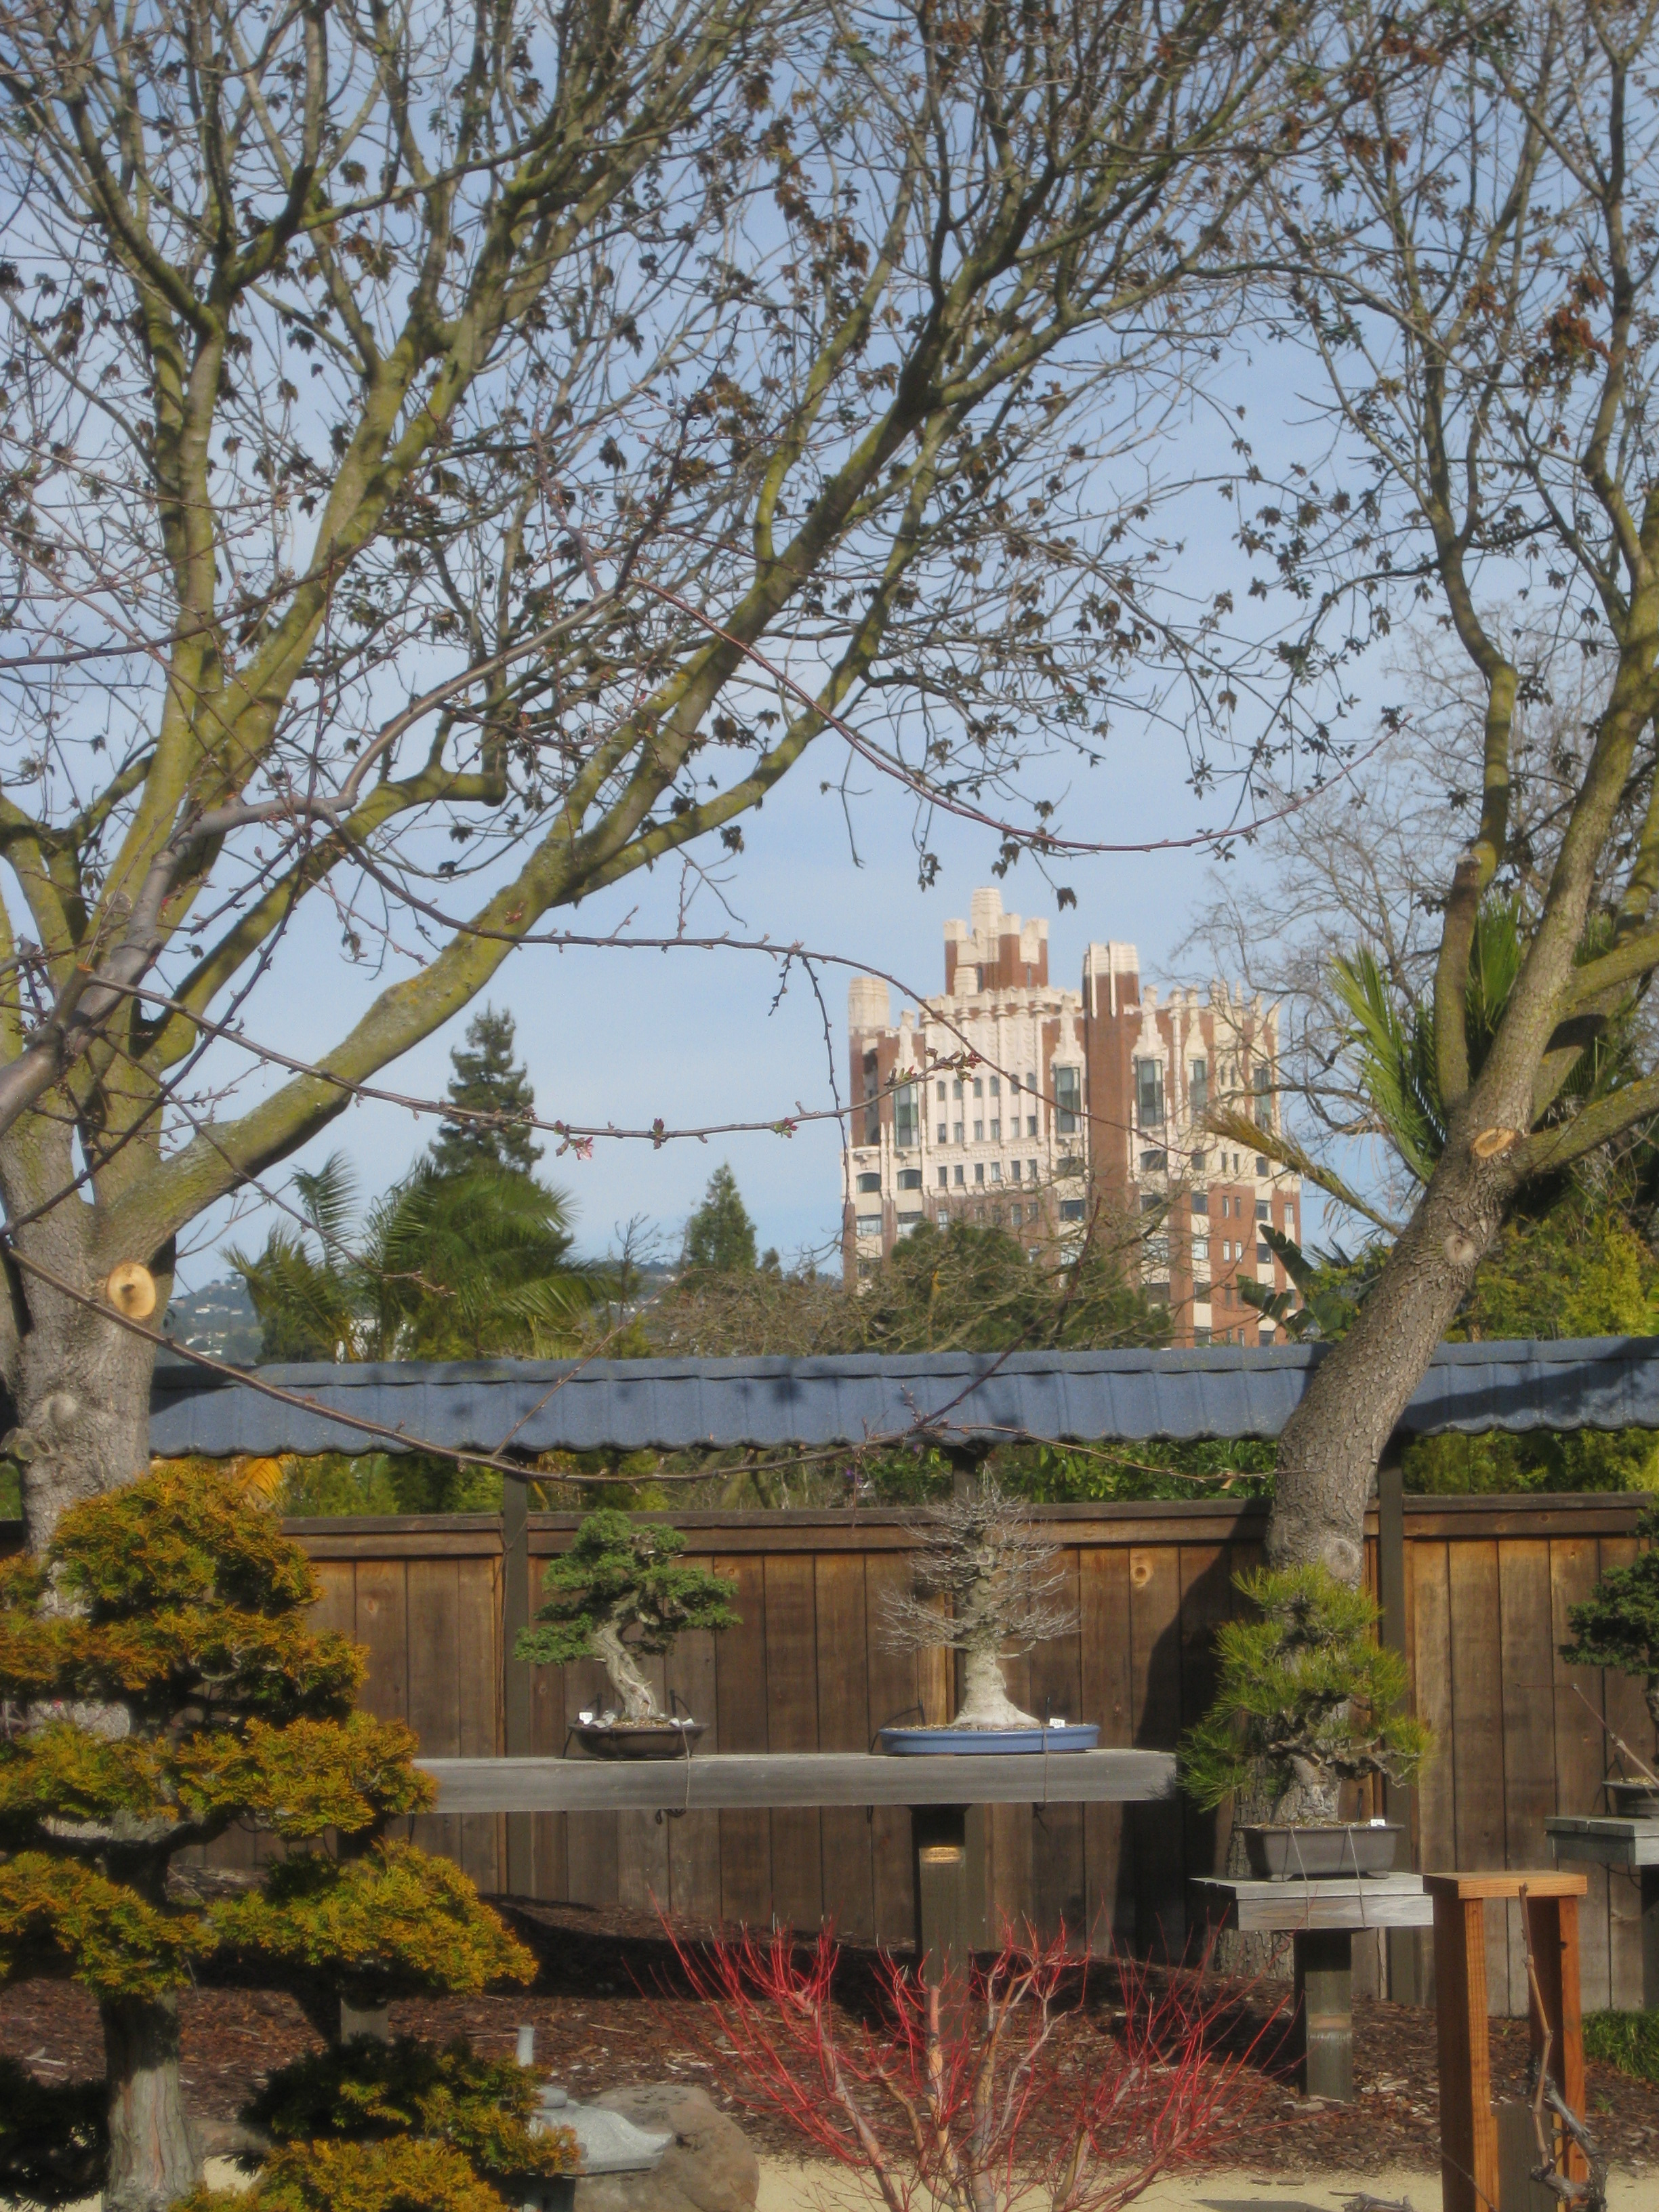 Bonsai Garden Oakland California Flickr Photo Sharing